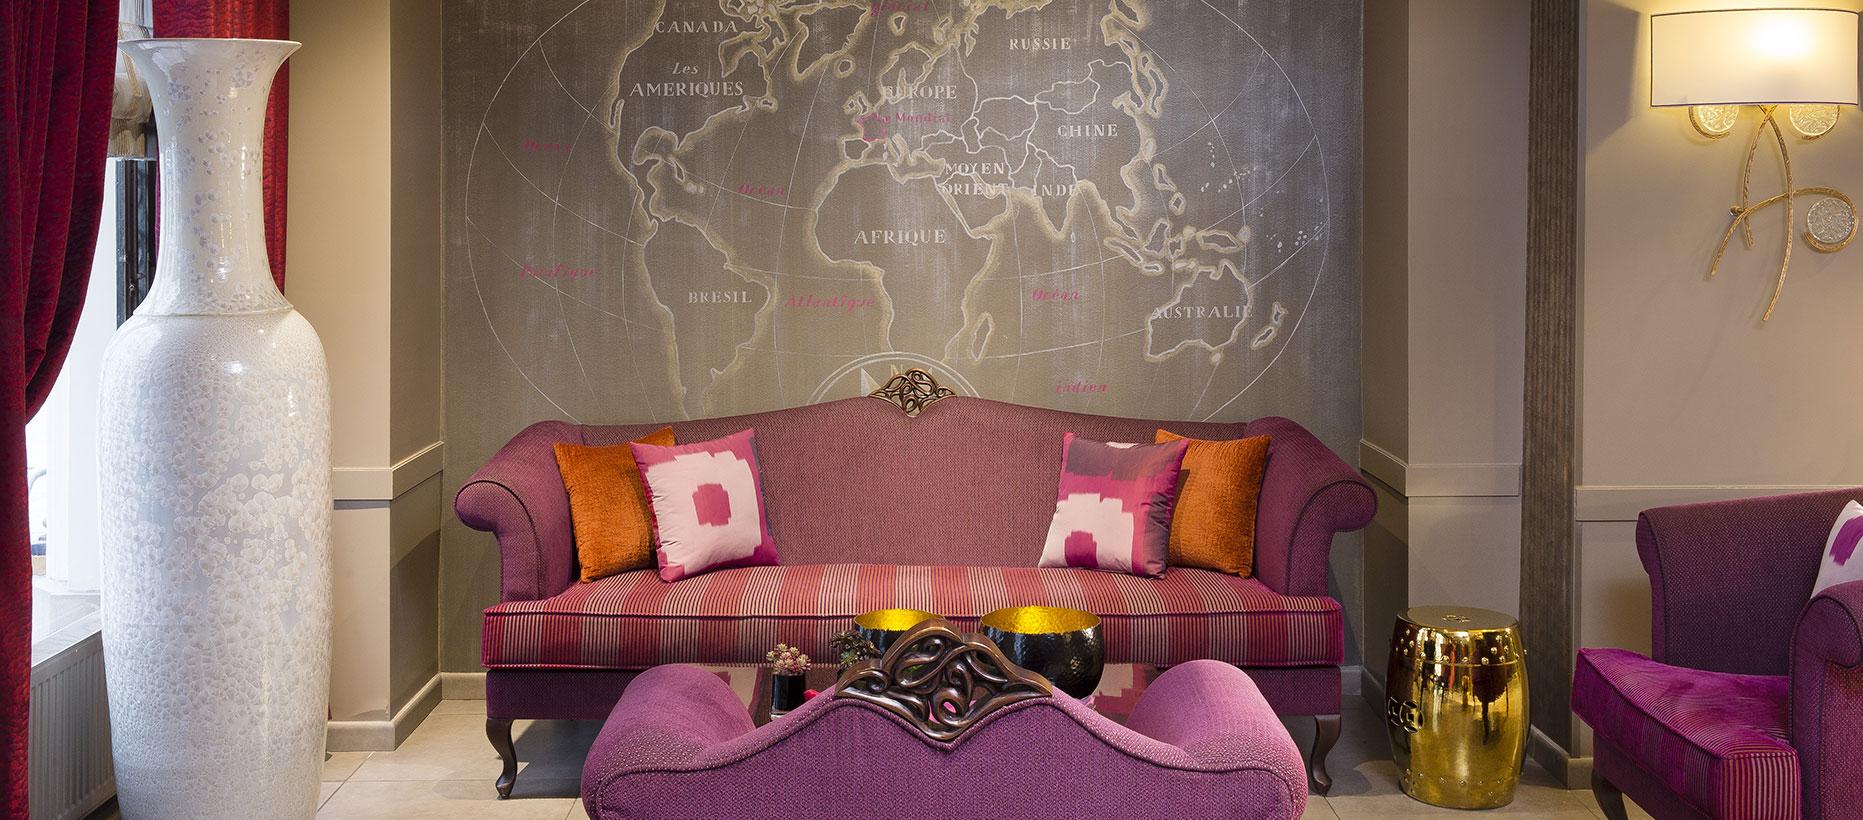 Hotel-mondial-paris-Lobby-c